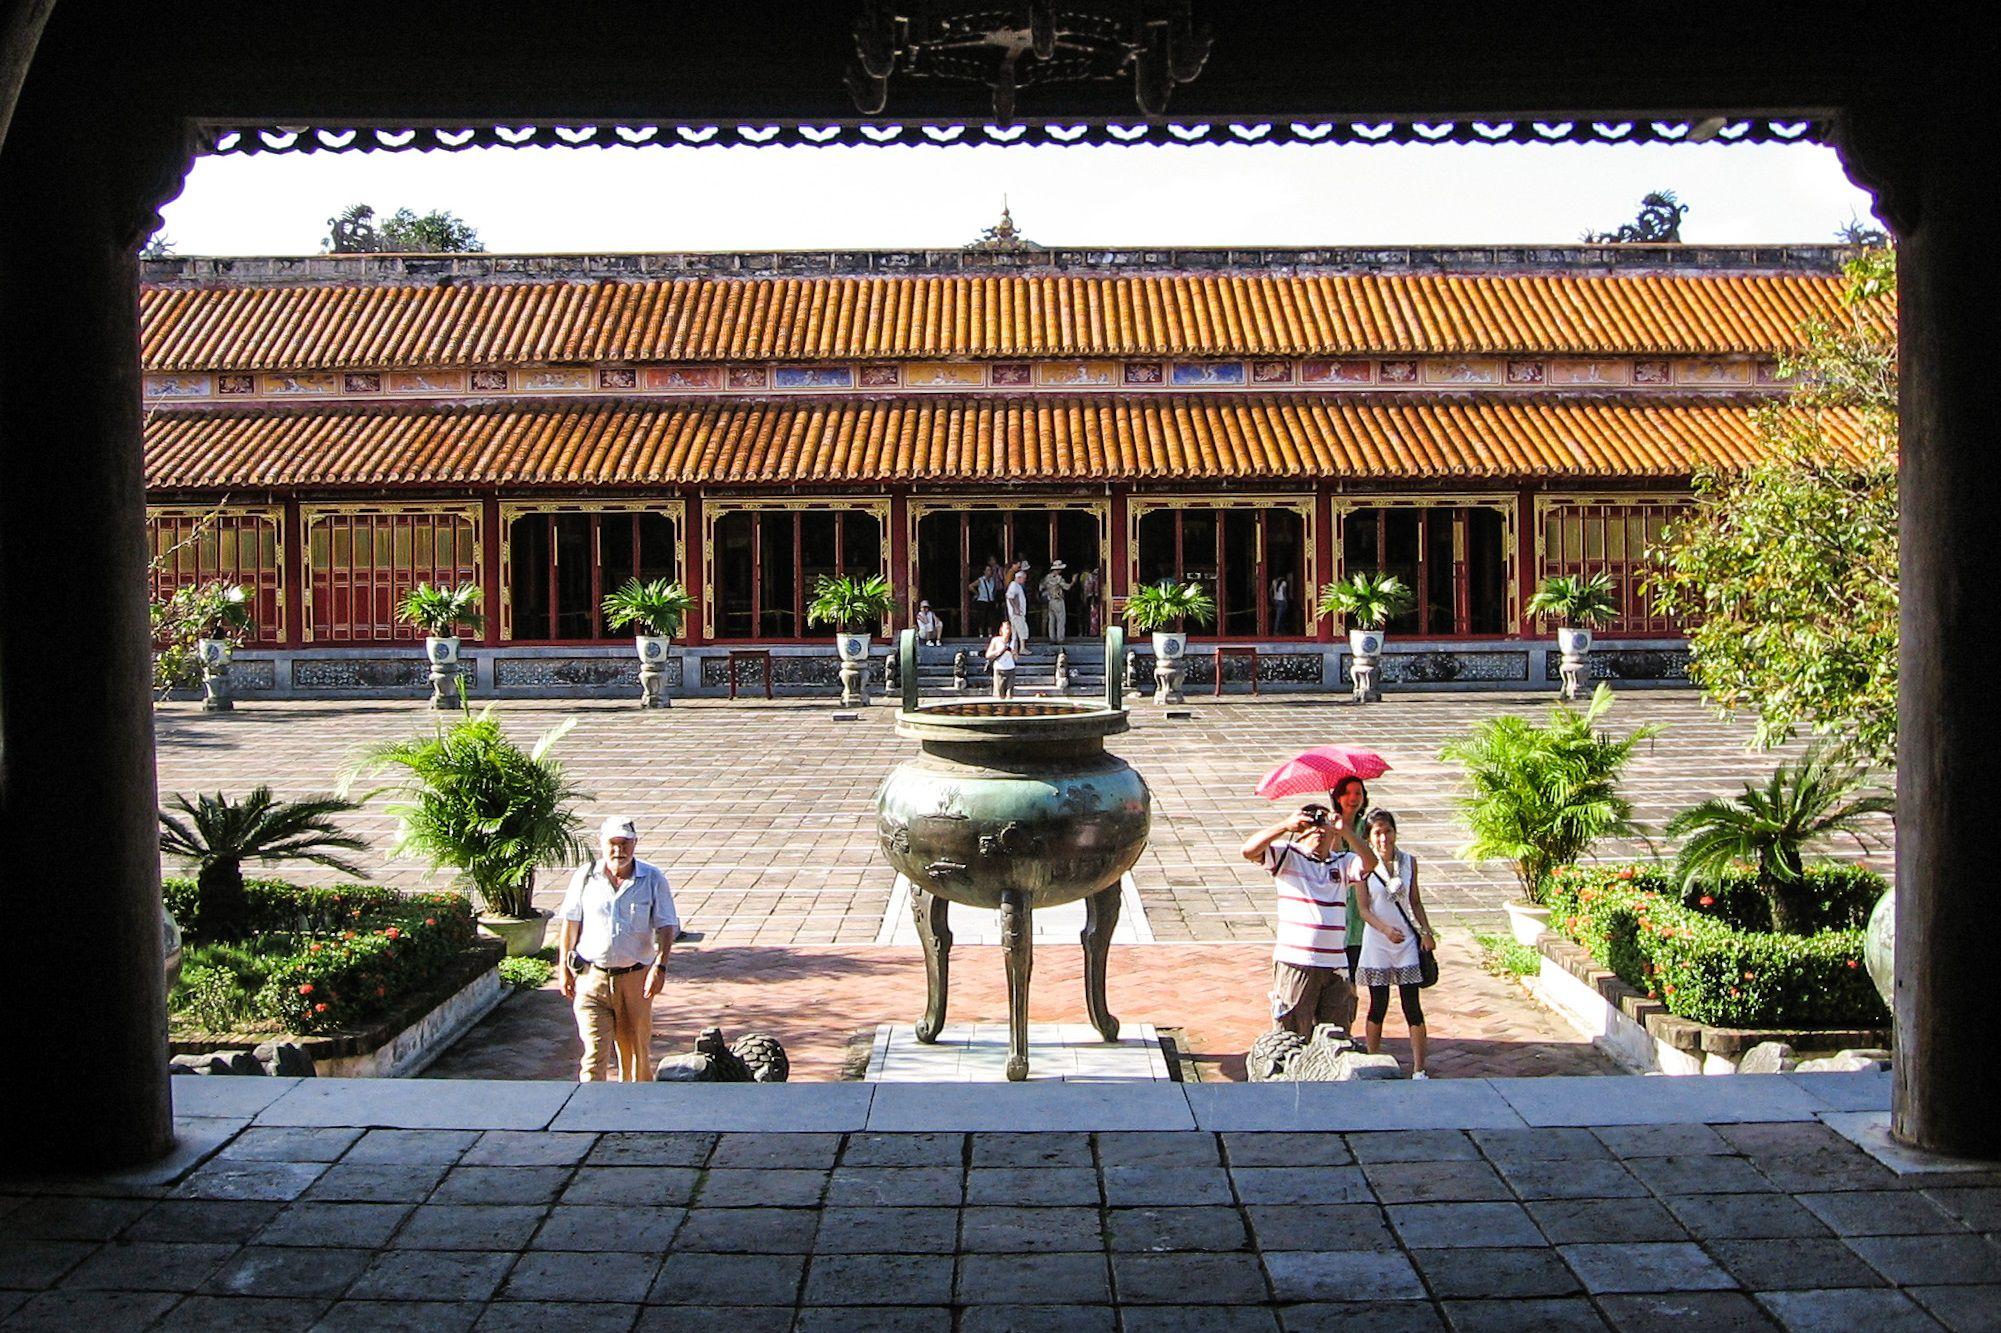 Exterior of The To Trieu temple, Hue Citadel, Vietnam.